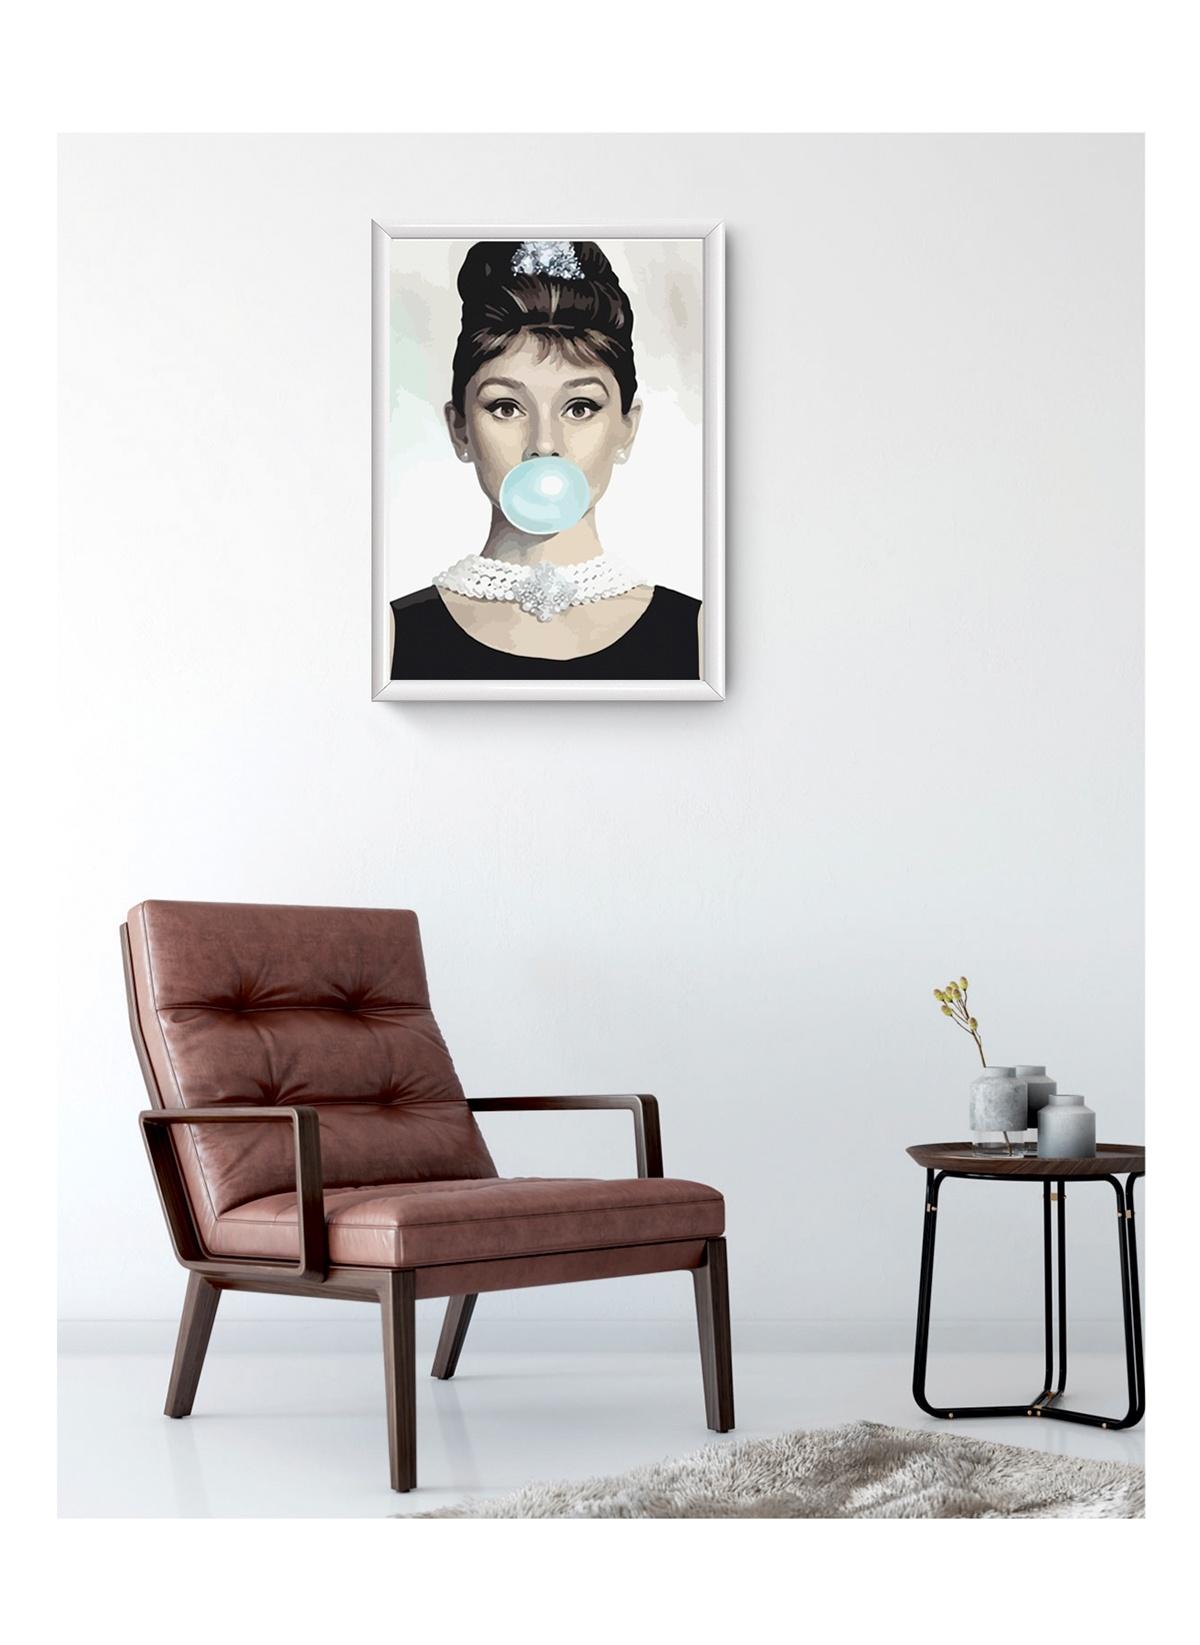 Standart Lyn Home & Decor Audrey Balon Çerçeveli Poster Tablo 33.5X43,5